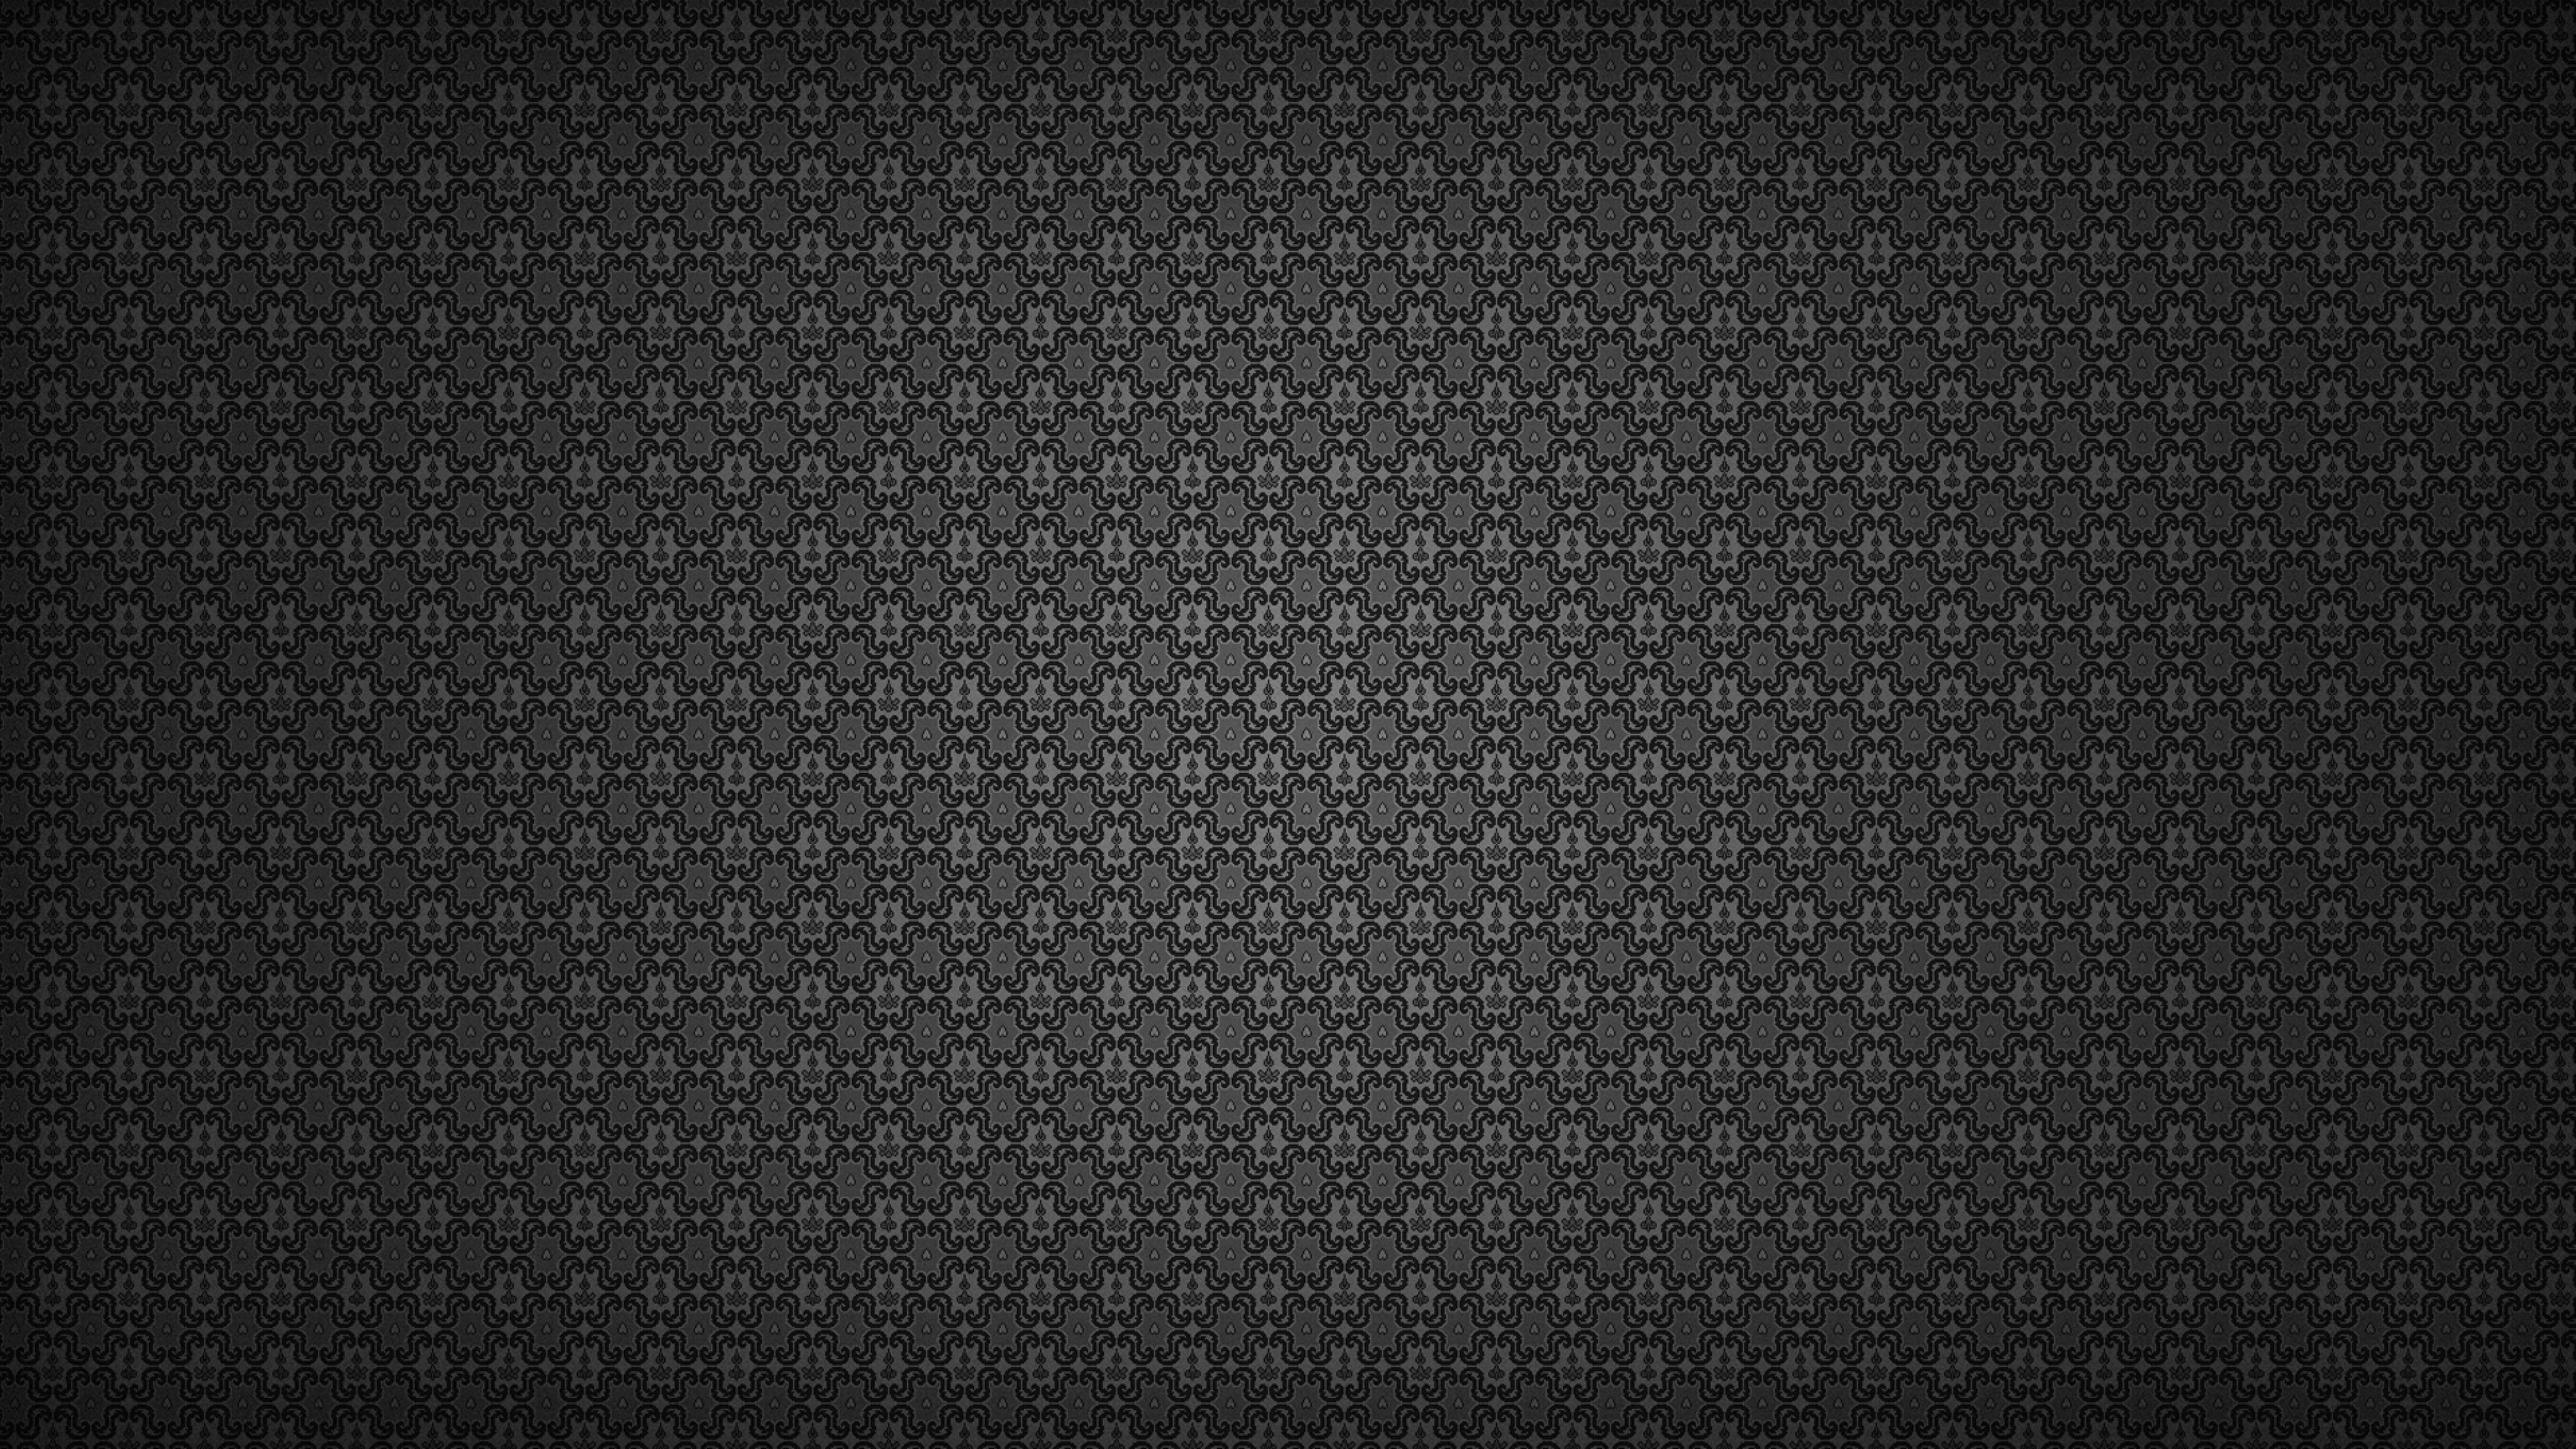 Wallpaper 3840x2160 style creative background pattern texture 4K 3840x2160